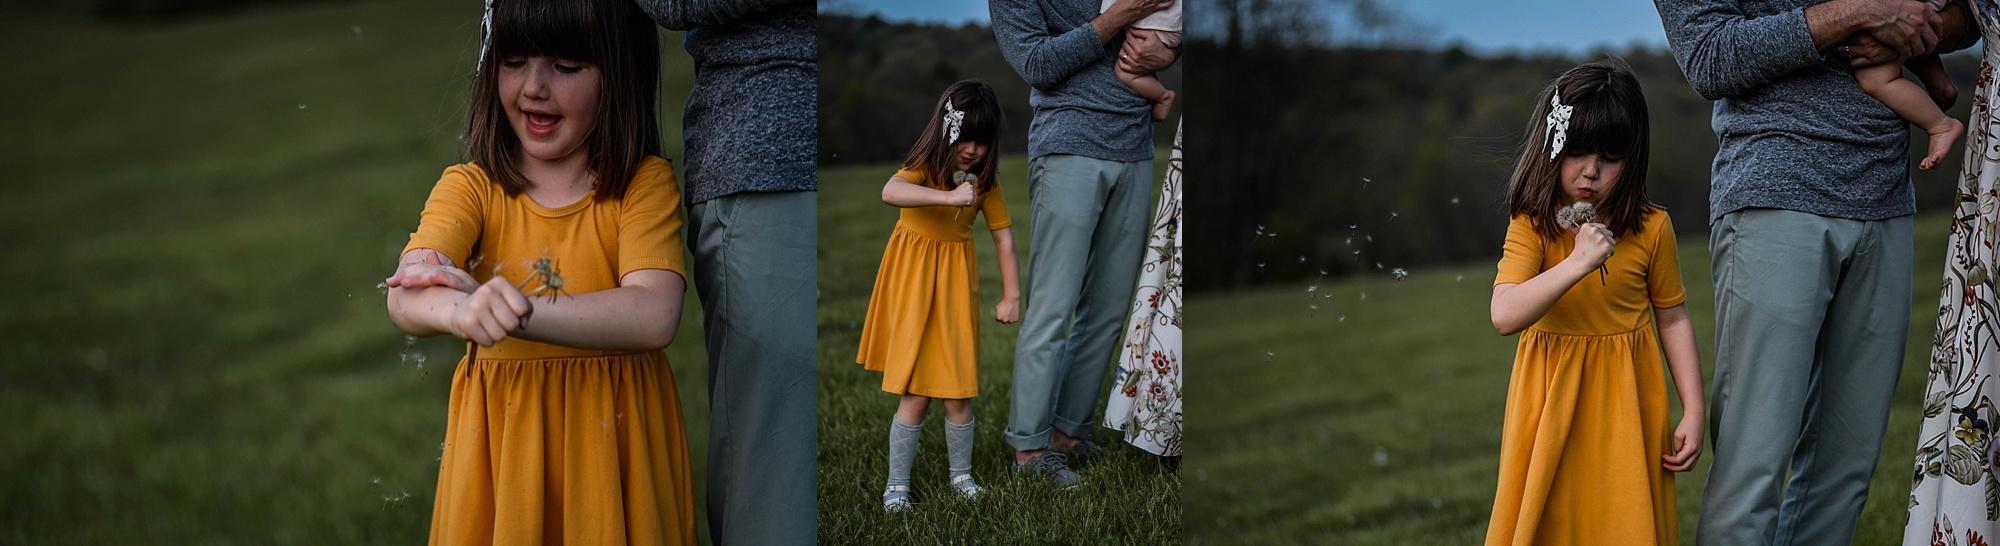 lauren-grayson-akron-ohio-family-photographer-molly_0003.jpg